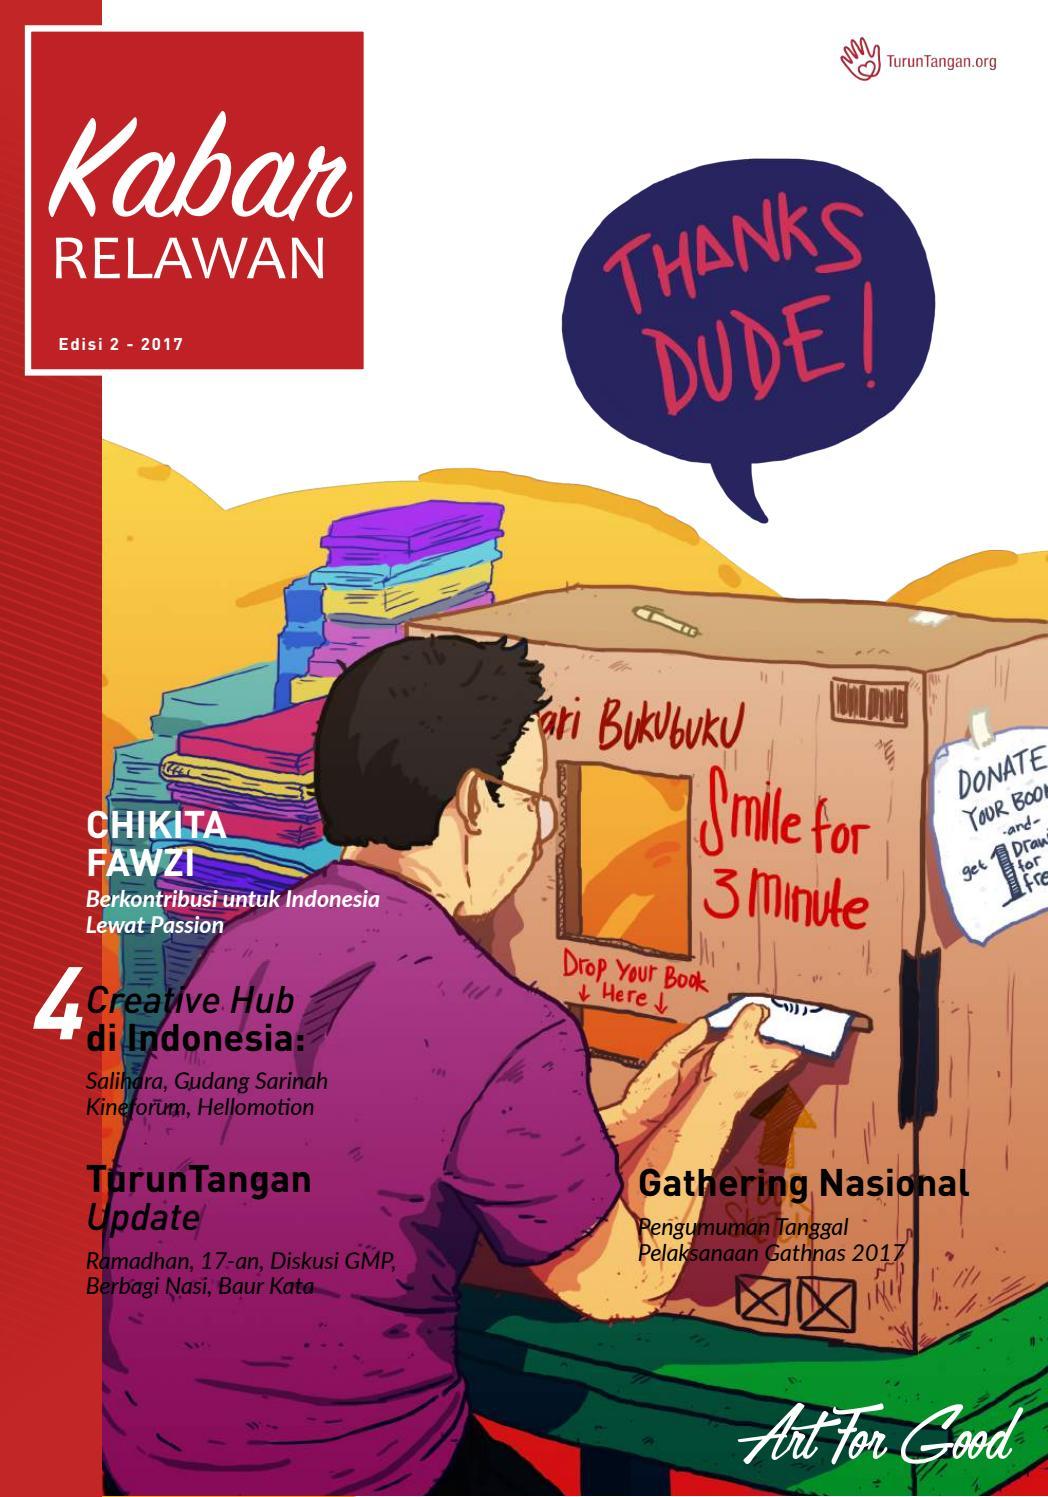 Kabar Relawan Edisi 12 By TurunTangan Issuu